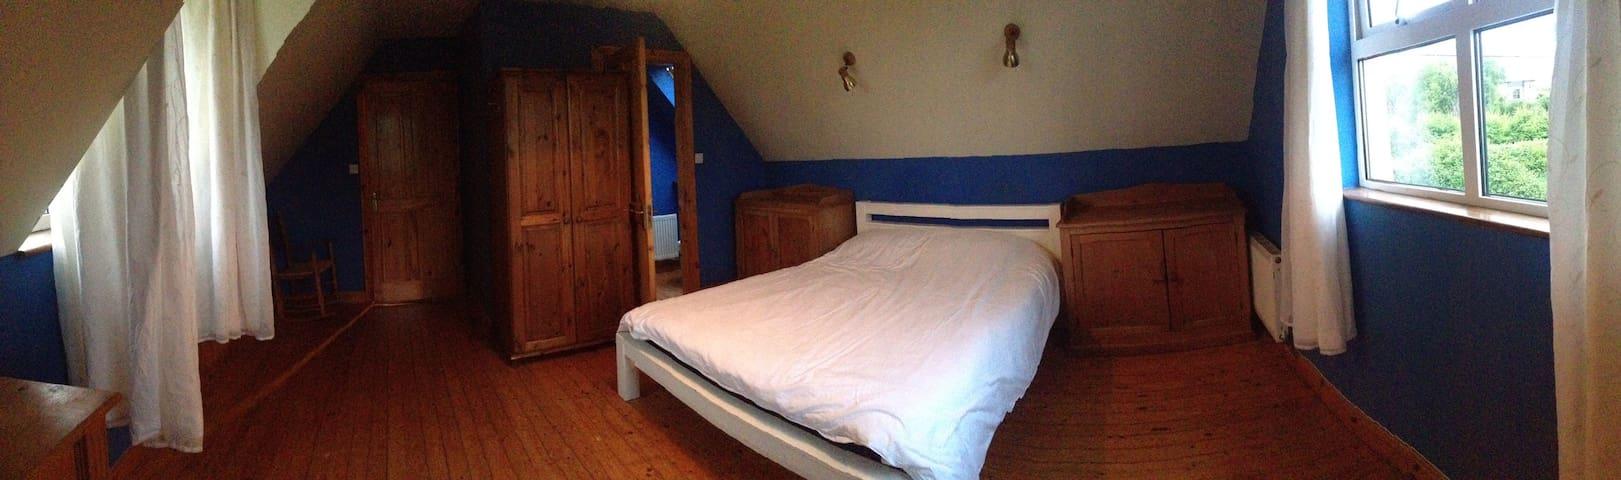 West Clare Killimer Ensuite Master Bedroom - Kilrush - Hus